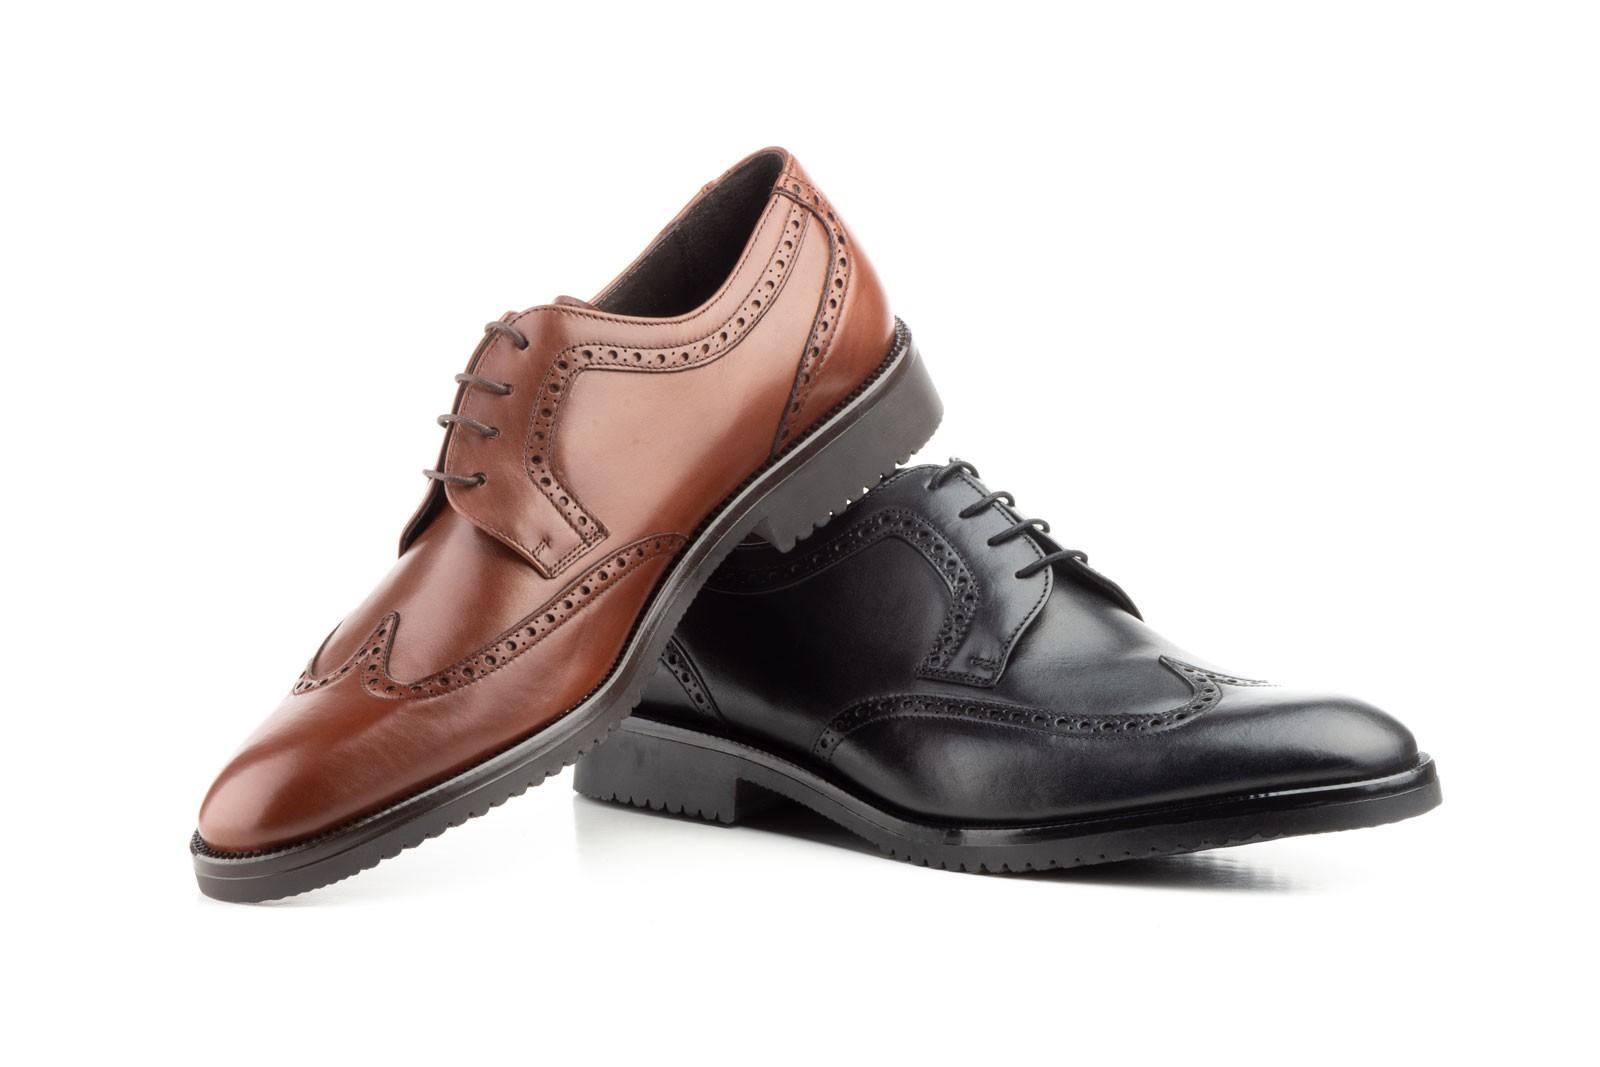 Zapatos Blucher Hombre Piel Negro Marrón